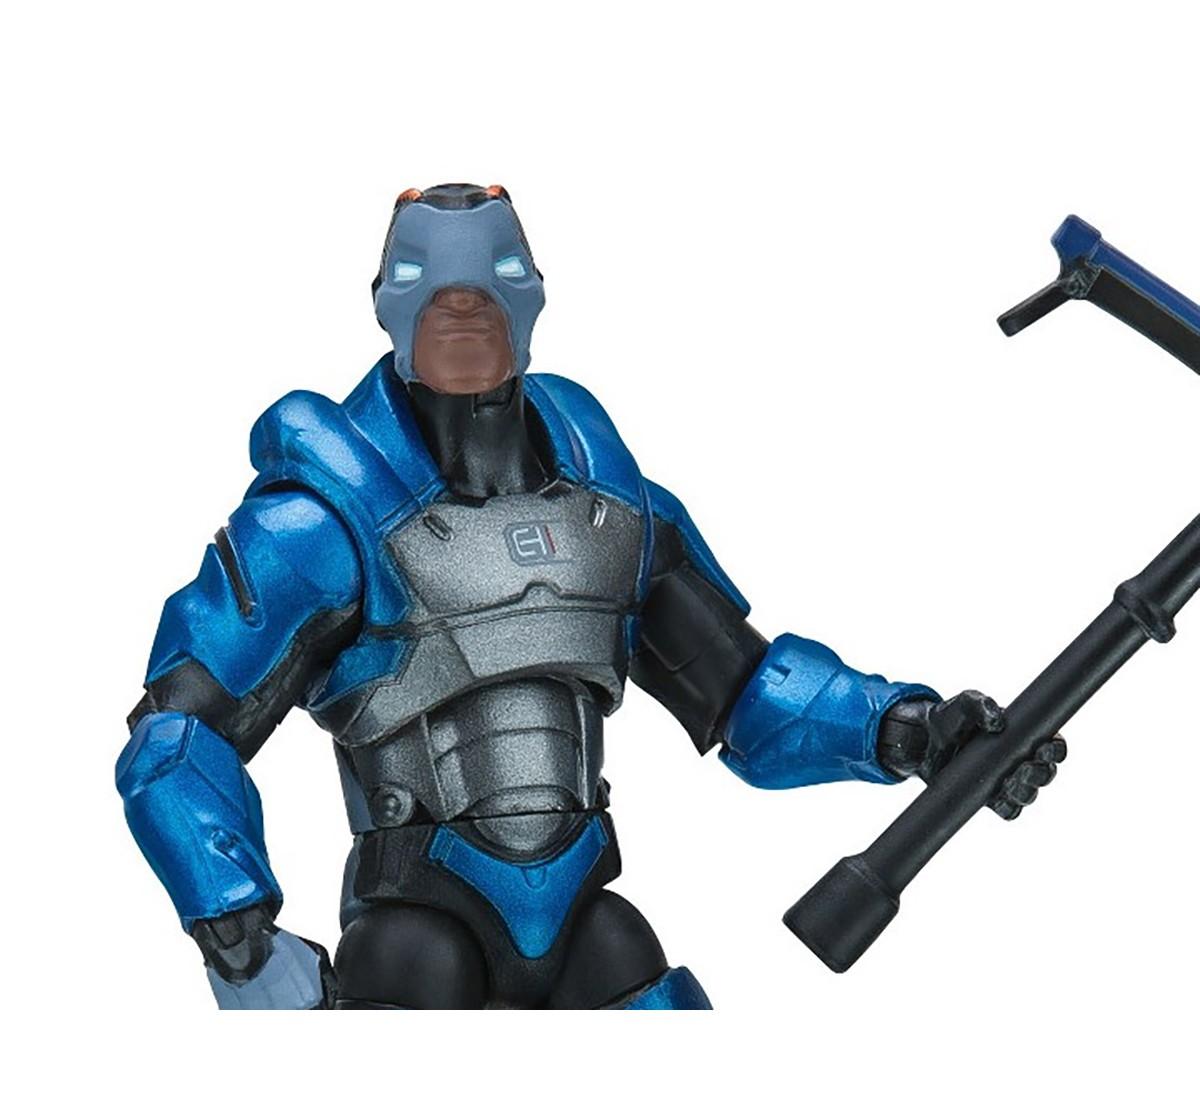 Fortnite Carbide Solo Mode Action Figure Action Figures for Kids age 8Y+ (Blue)